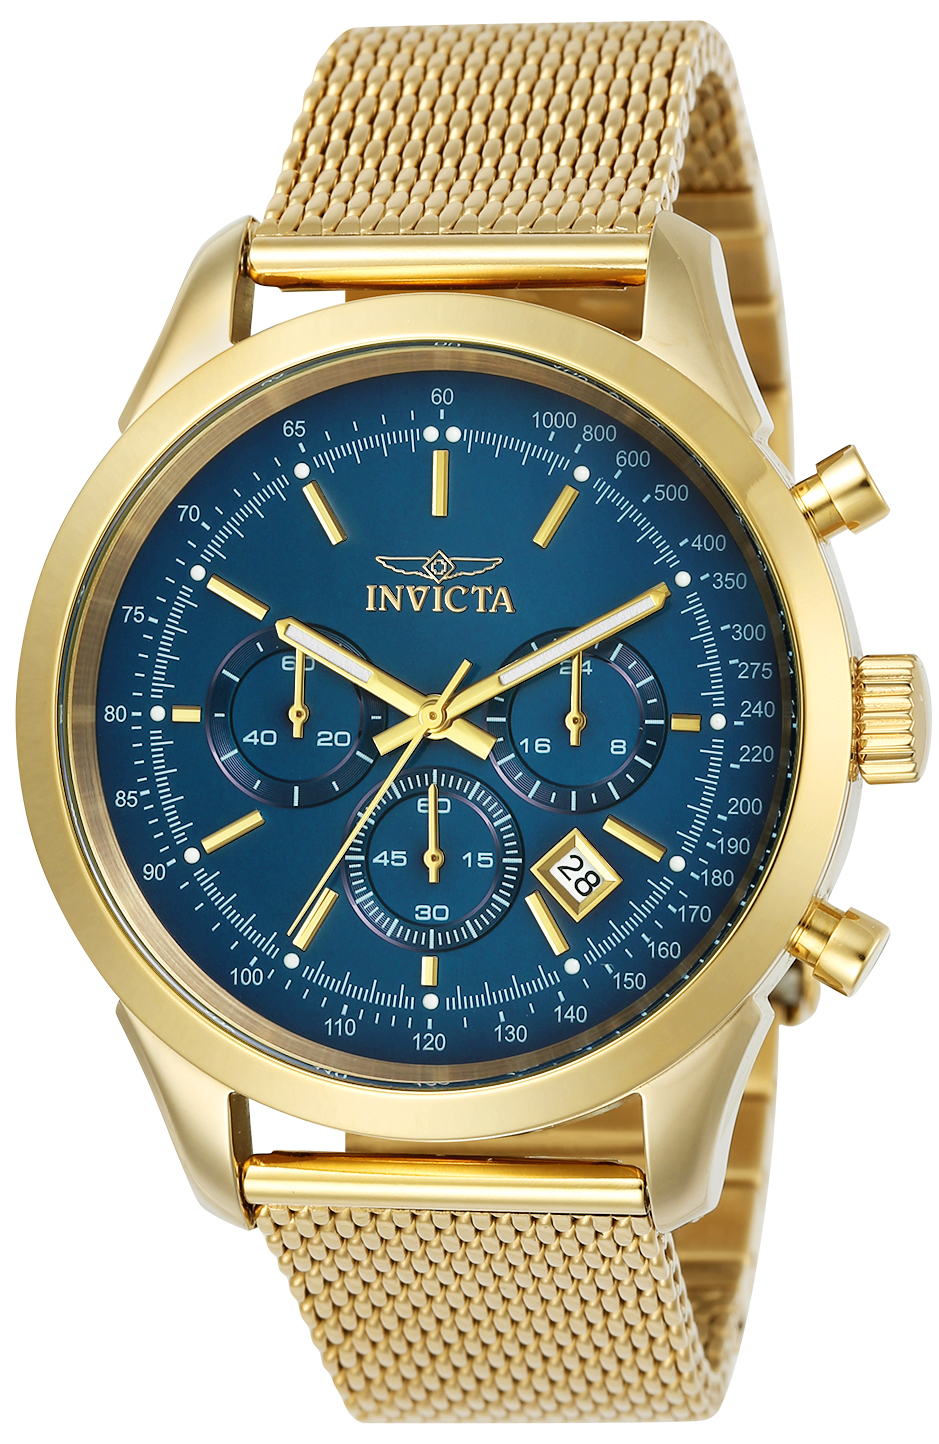 Invicta Men's 25224 Speedway Quartz Chronograph Blue Dial Watch